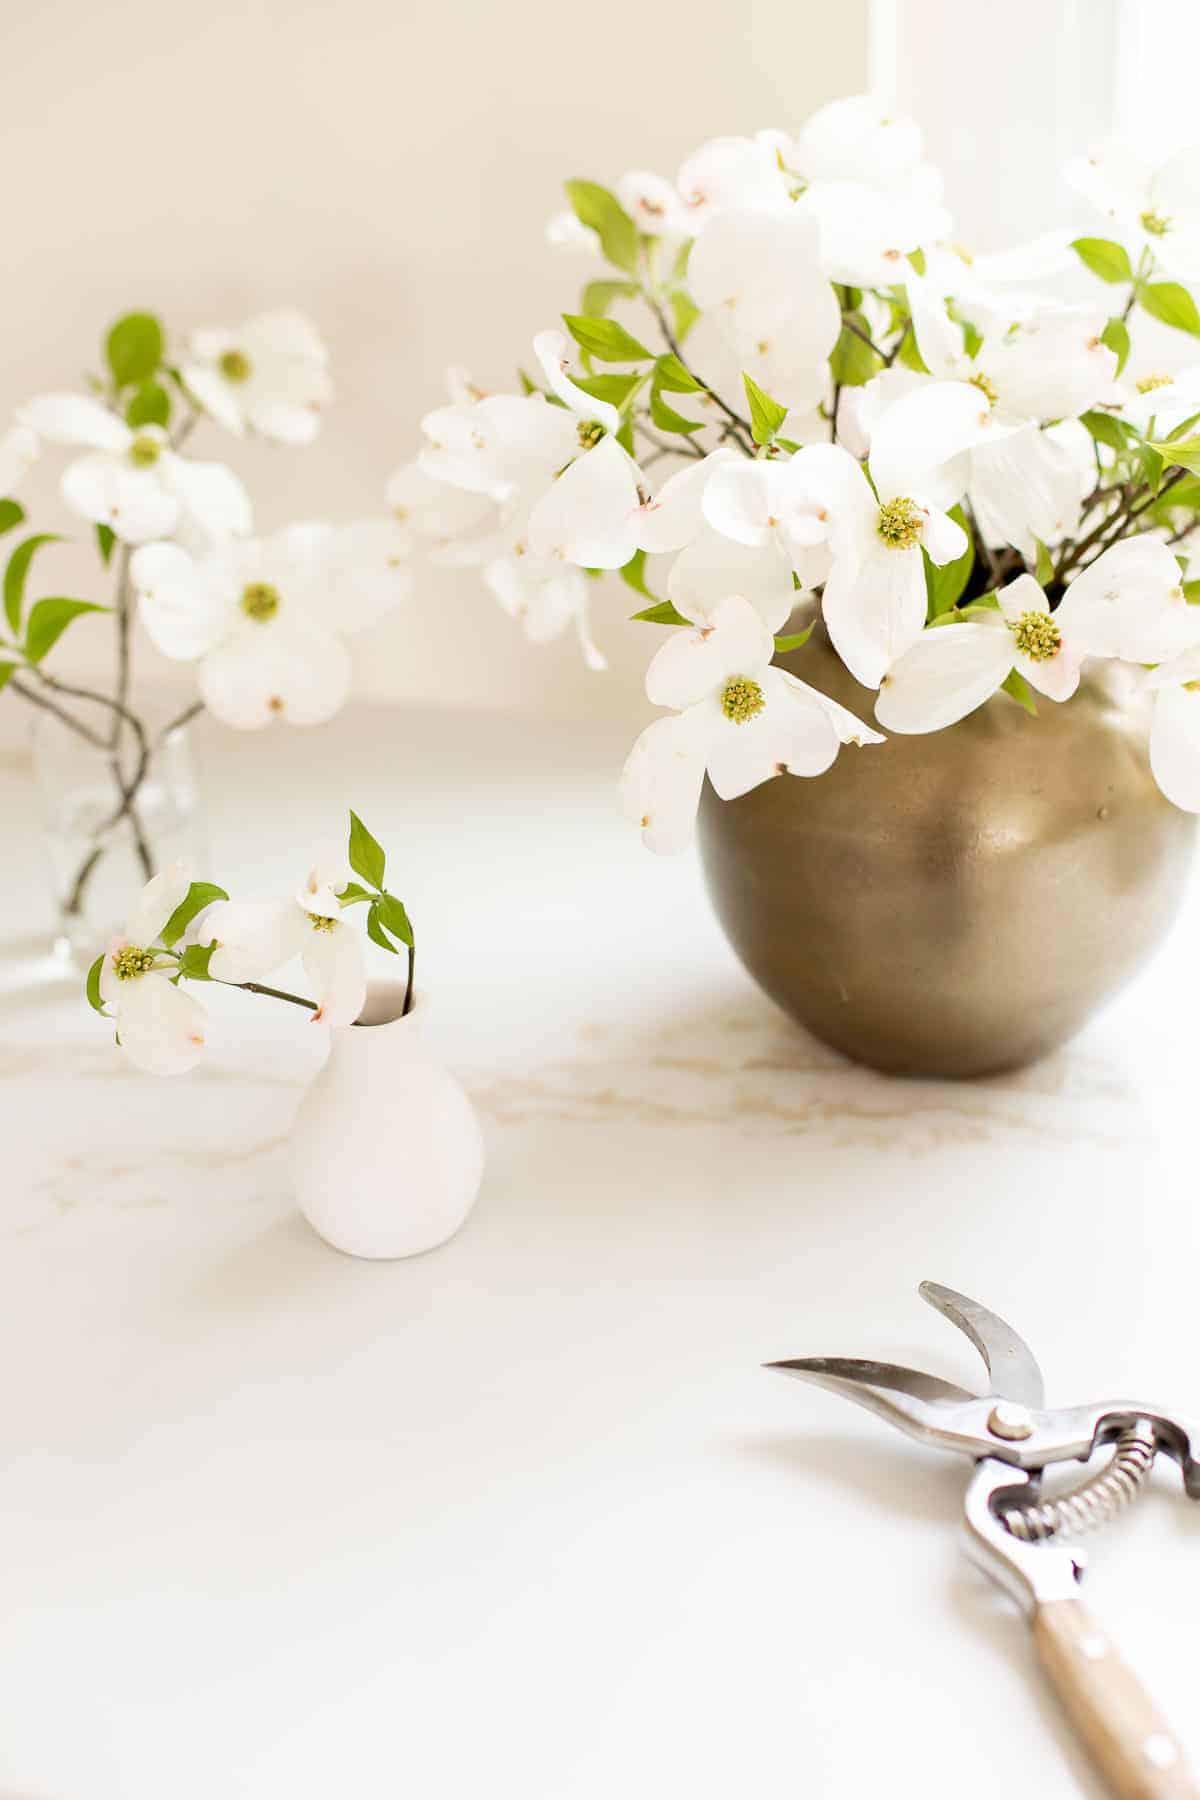 flowers on quartz counters